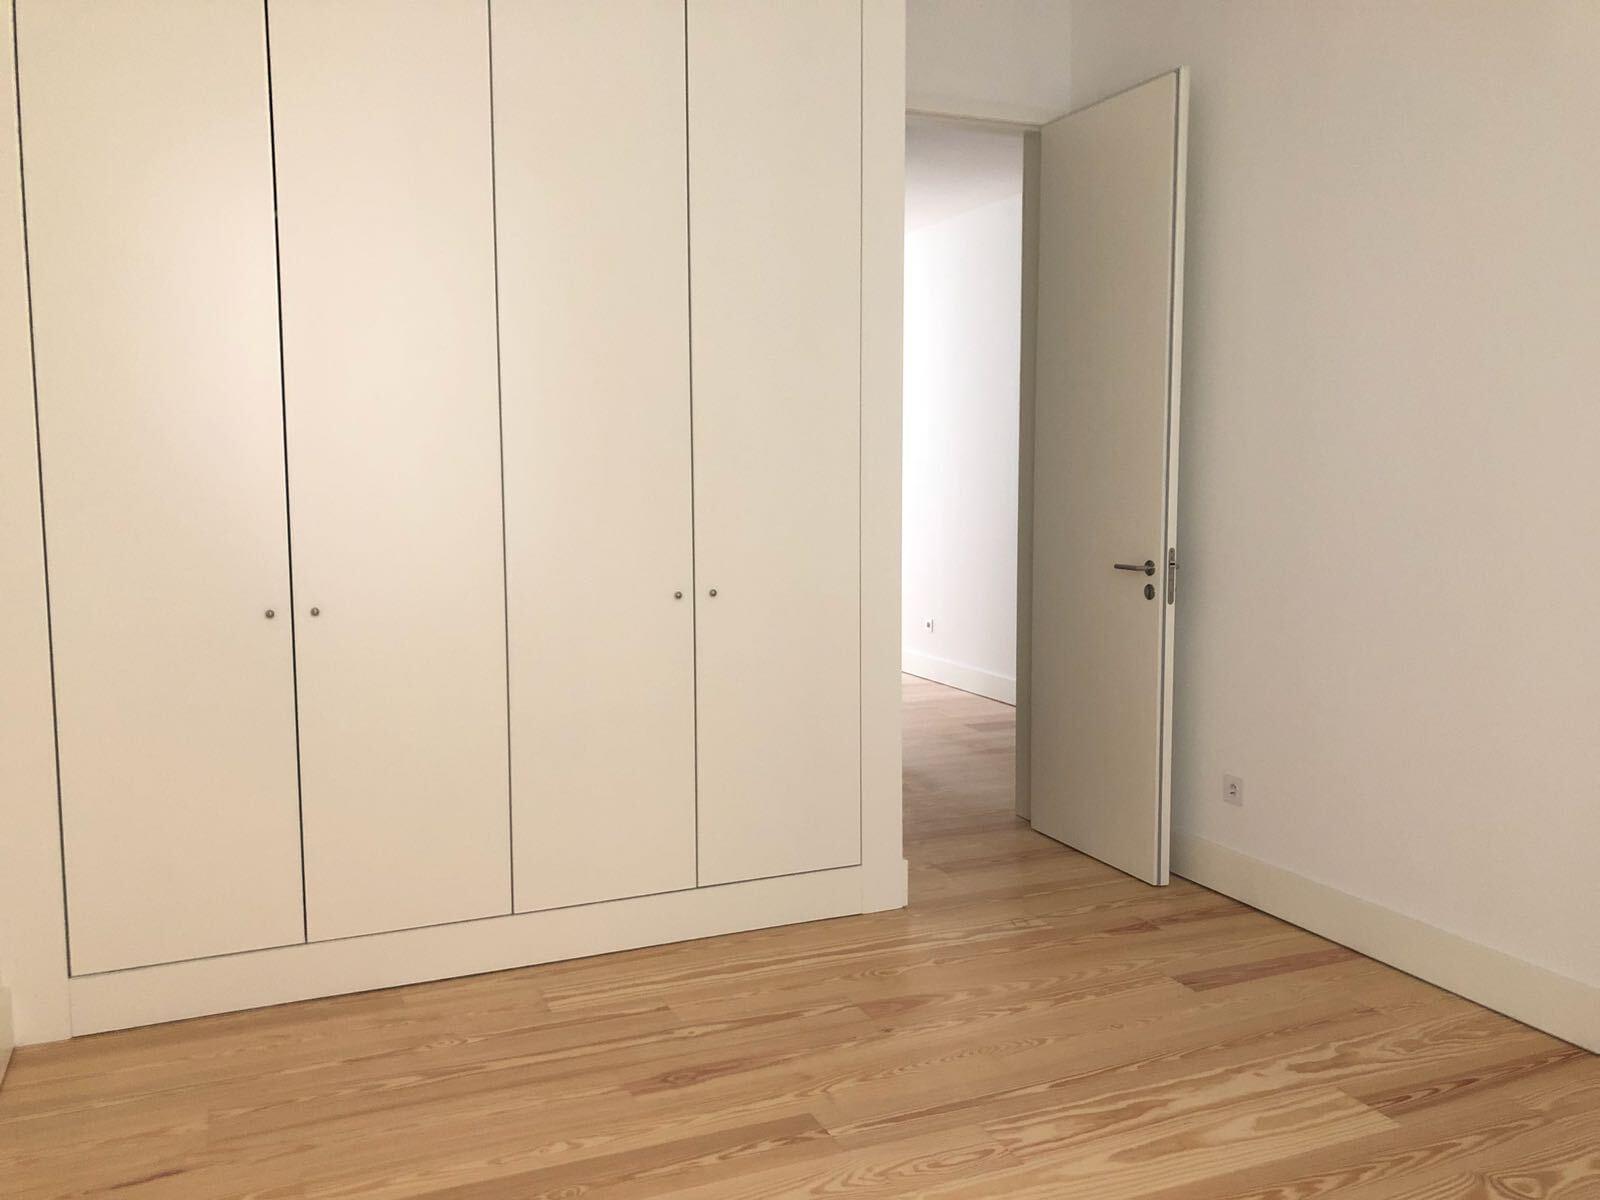 pf17142-apartamento-t2-lisboa-a413b0ac-2c6f-4e53-aaad-371b5af6f23b